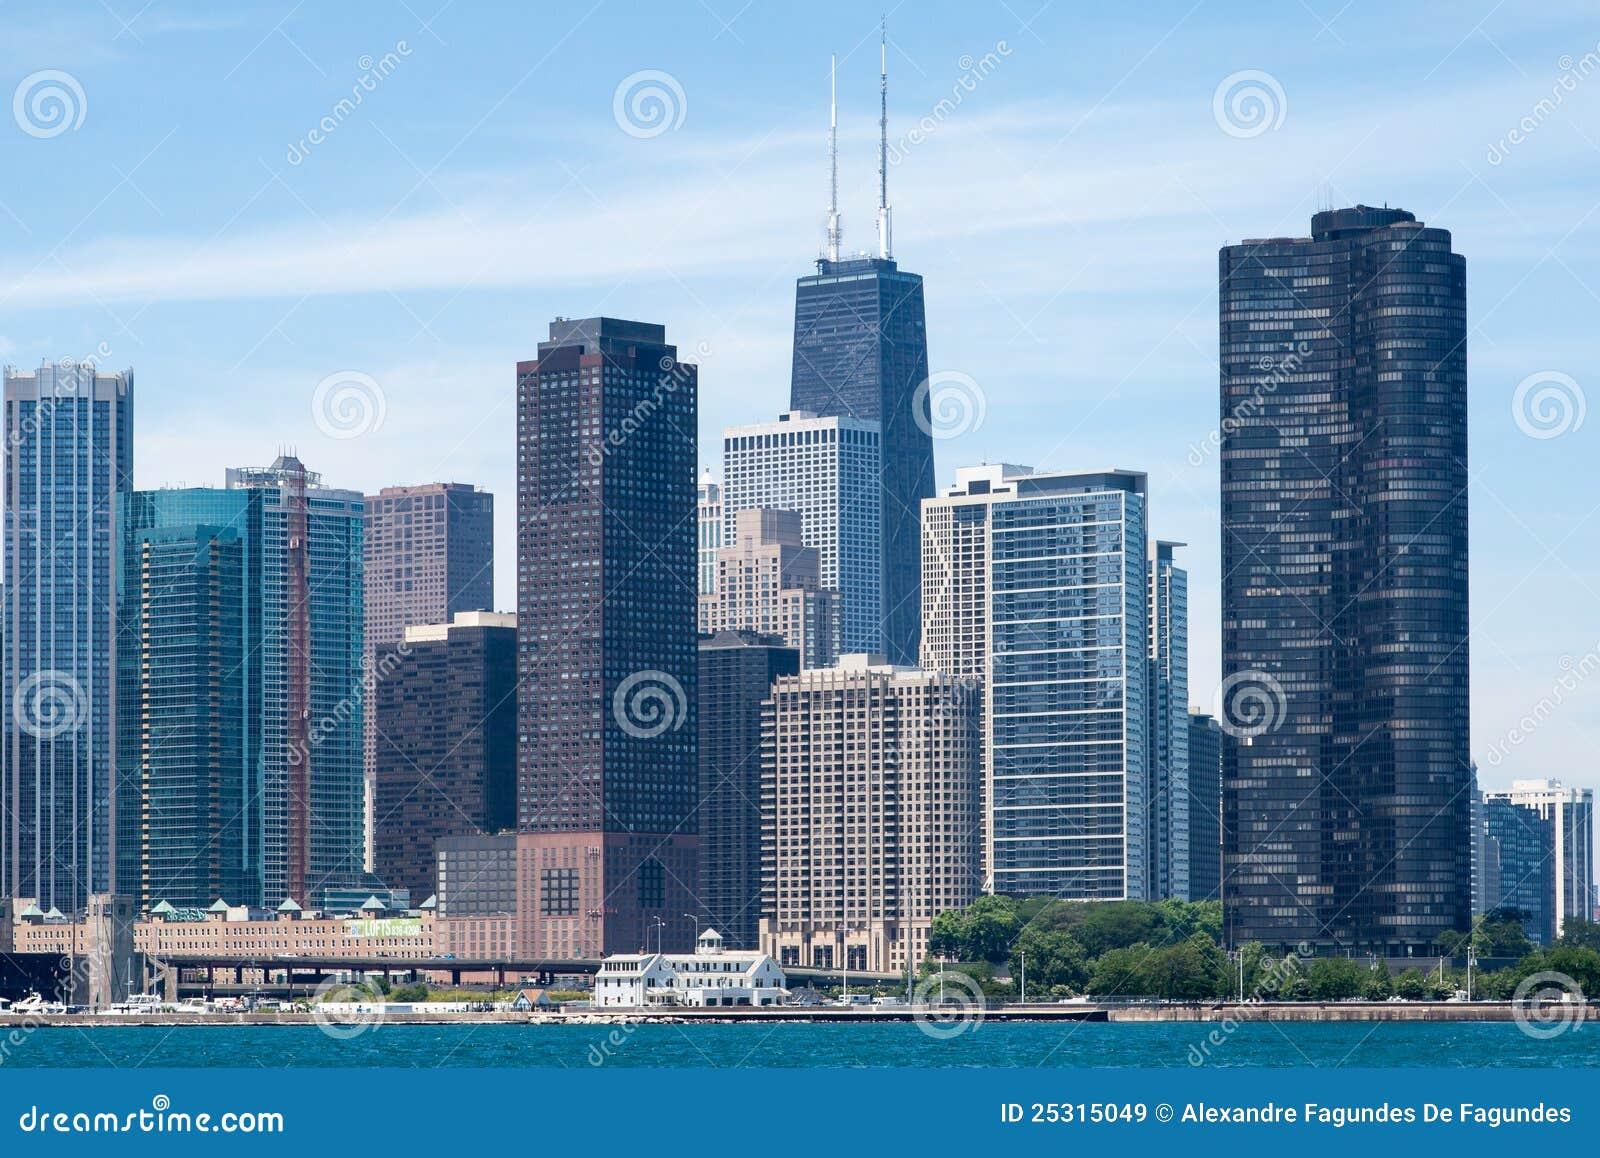 The City Modern Buildings